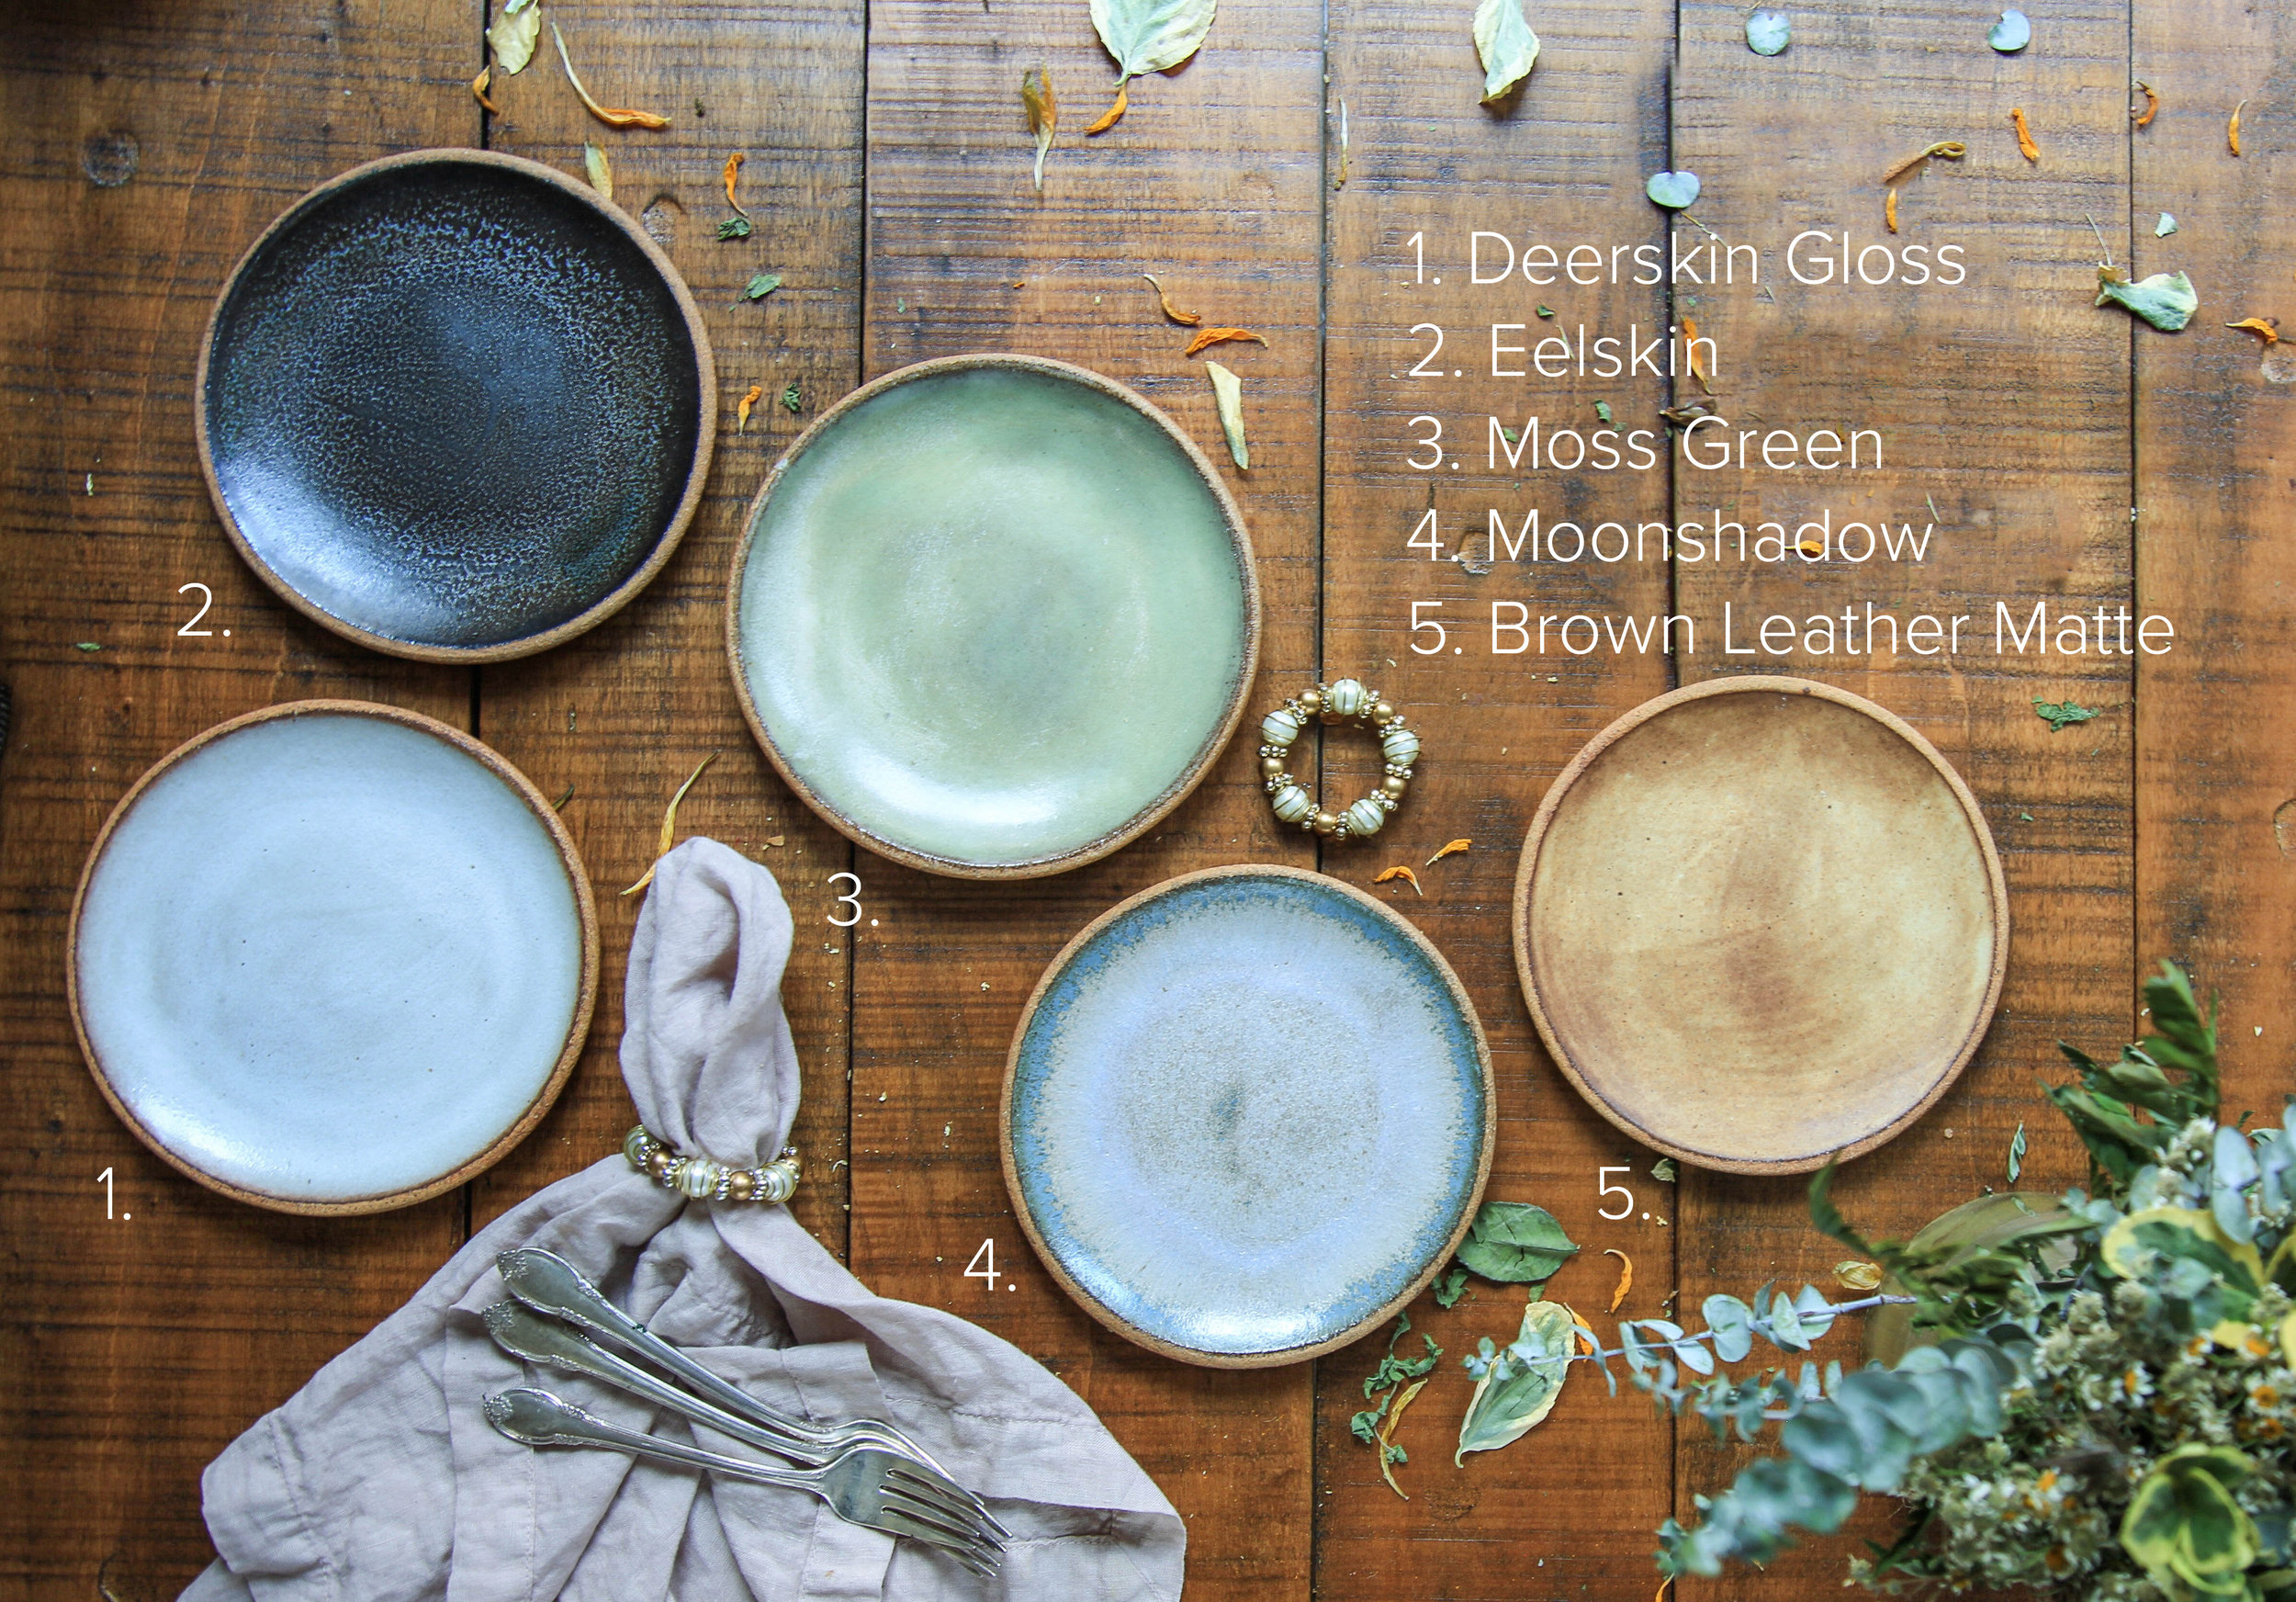 Glaze Examples on Salad Plates